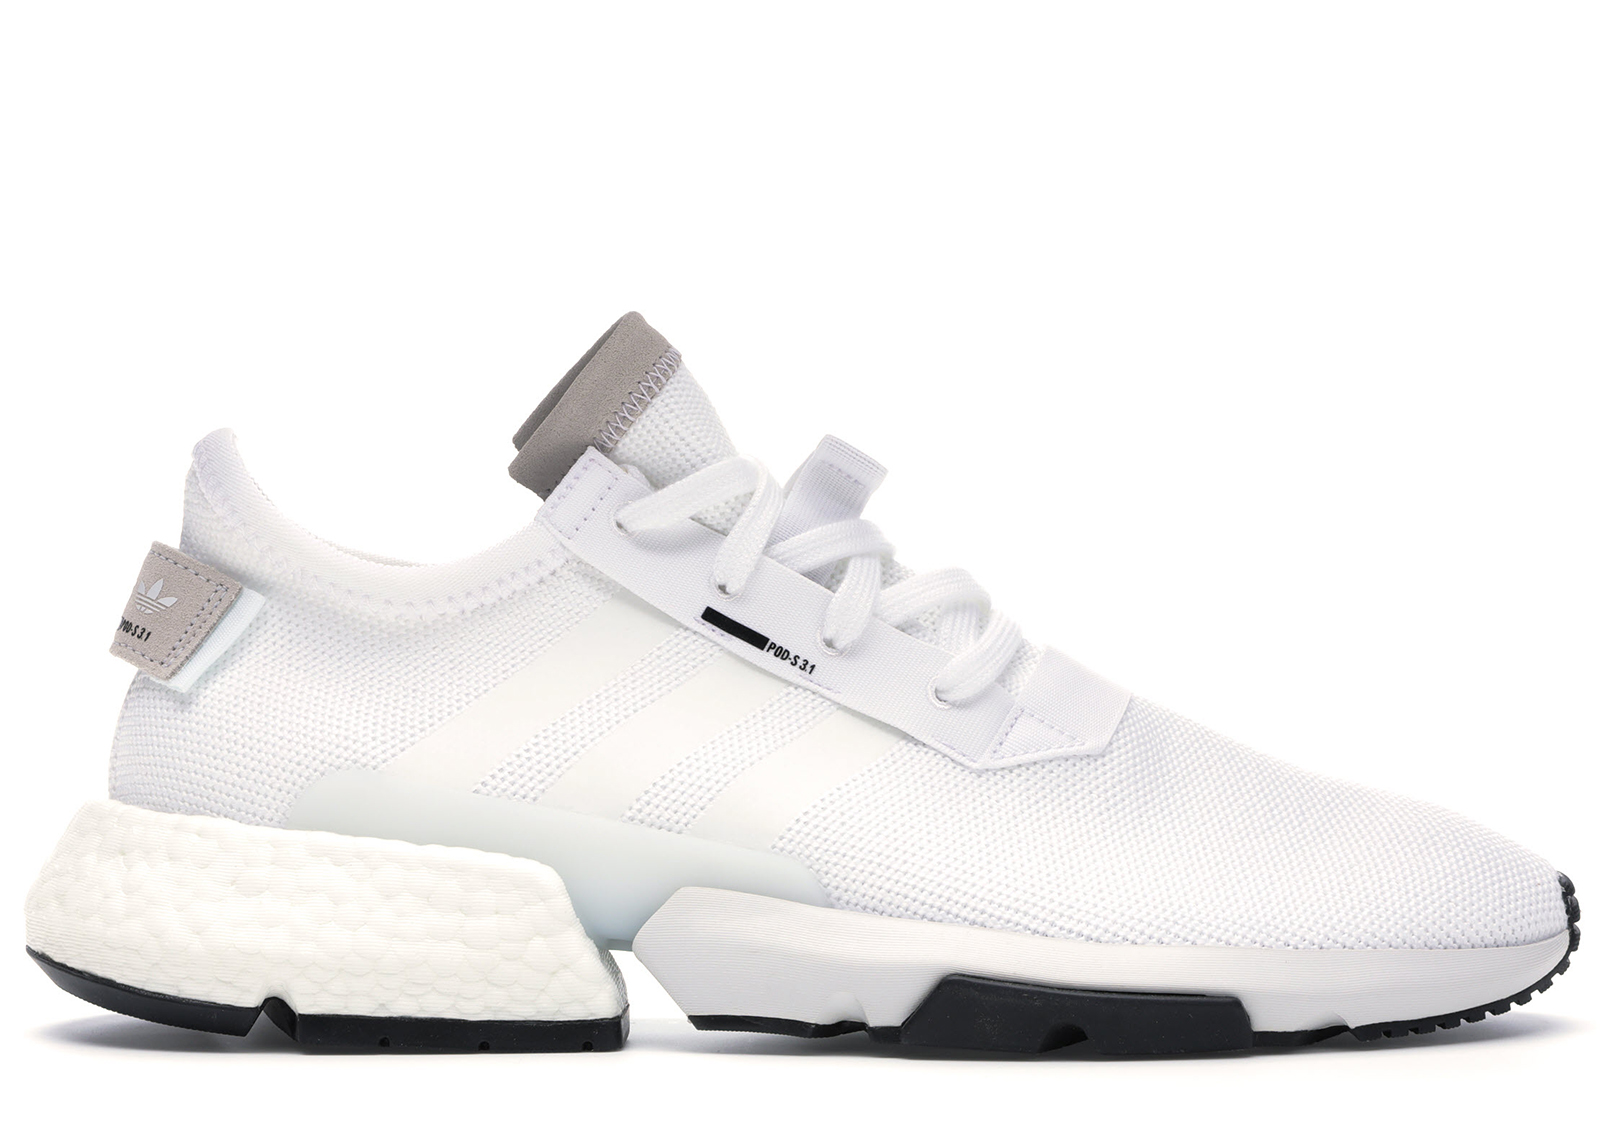 adidas POD-S3.1 Cloud White Core Black